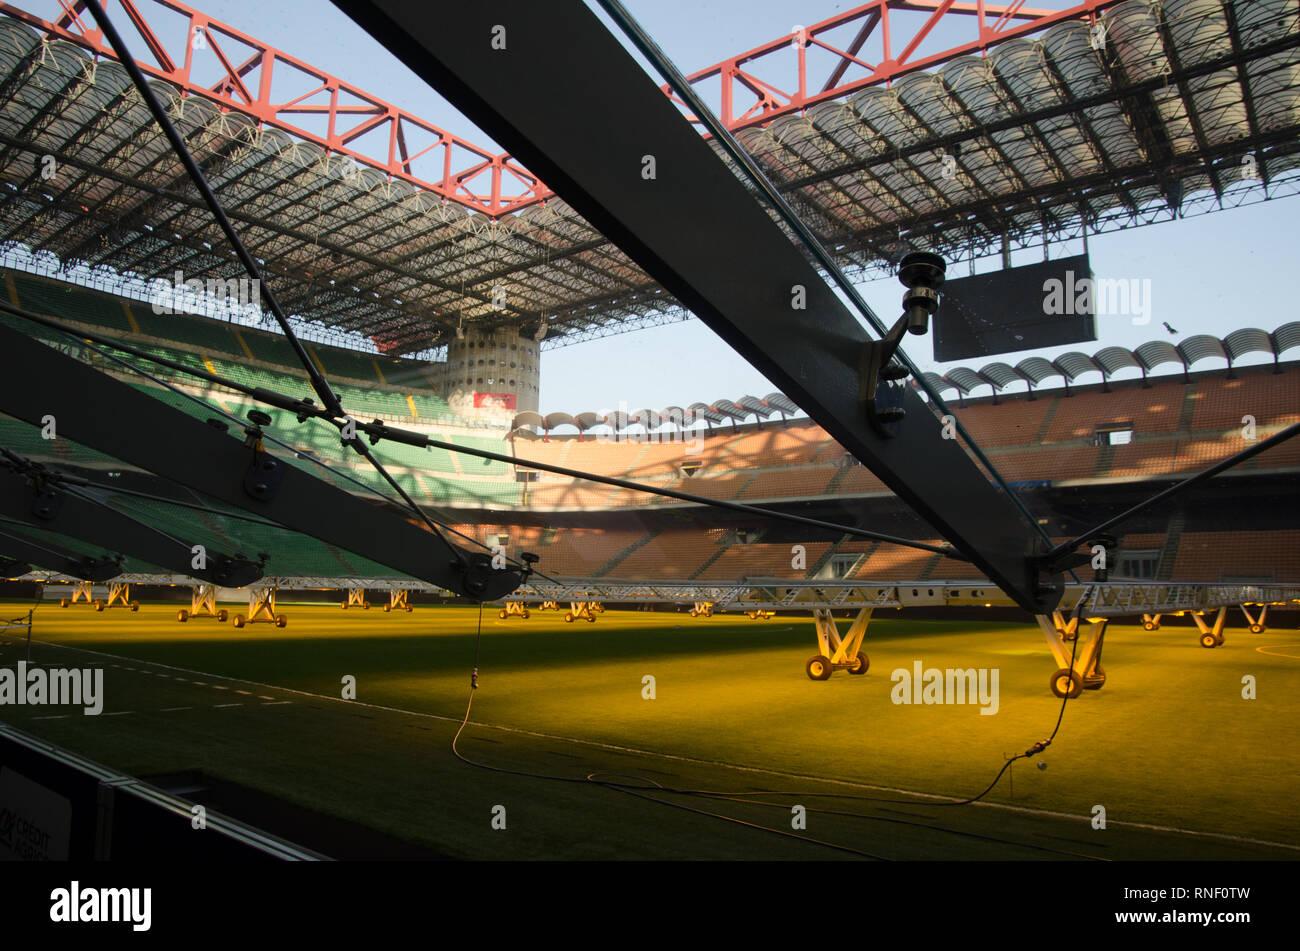 Meazza Stadium, also known as San Siro, in Milano. February 18th, 2019 Stock Photo